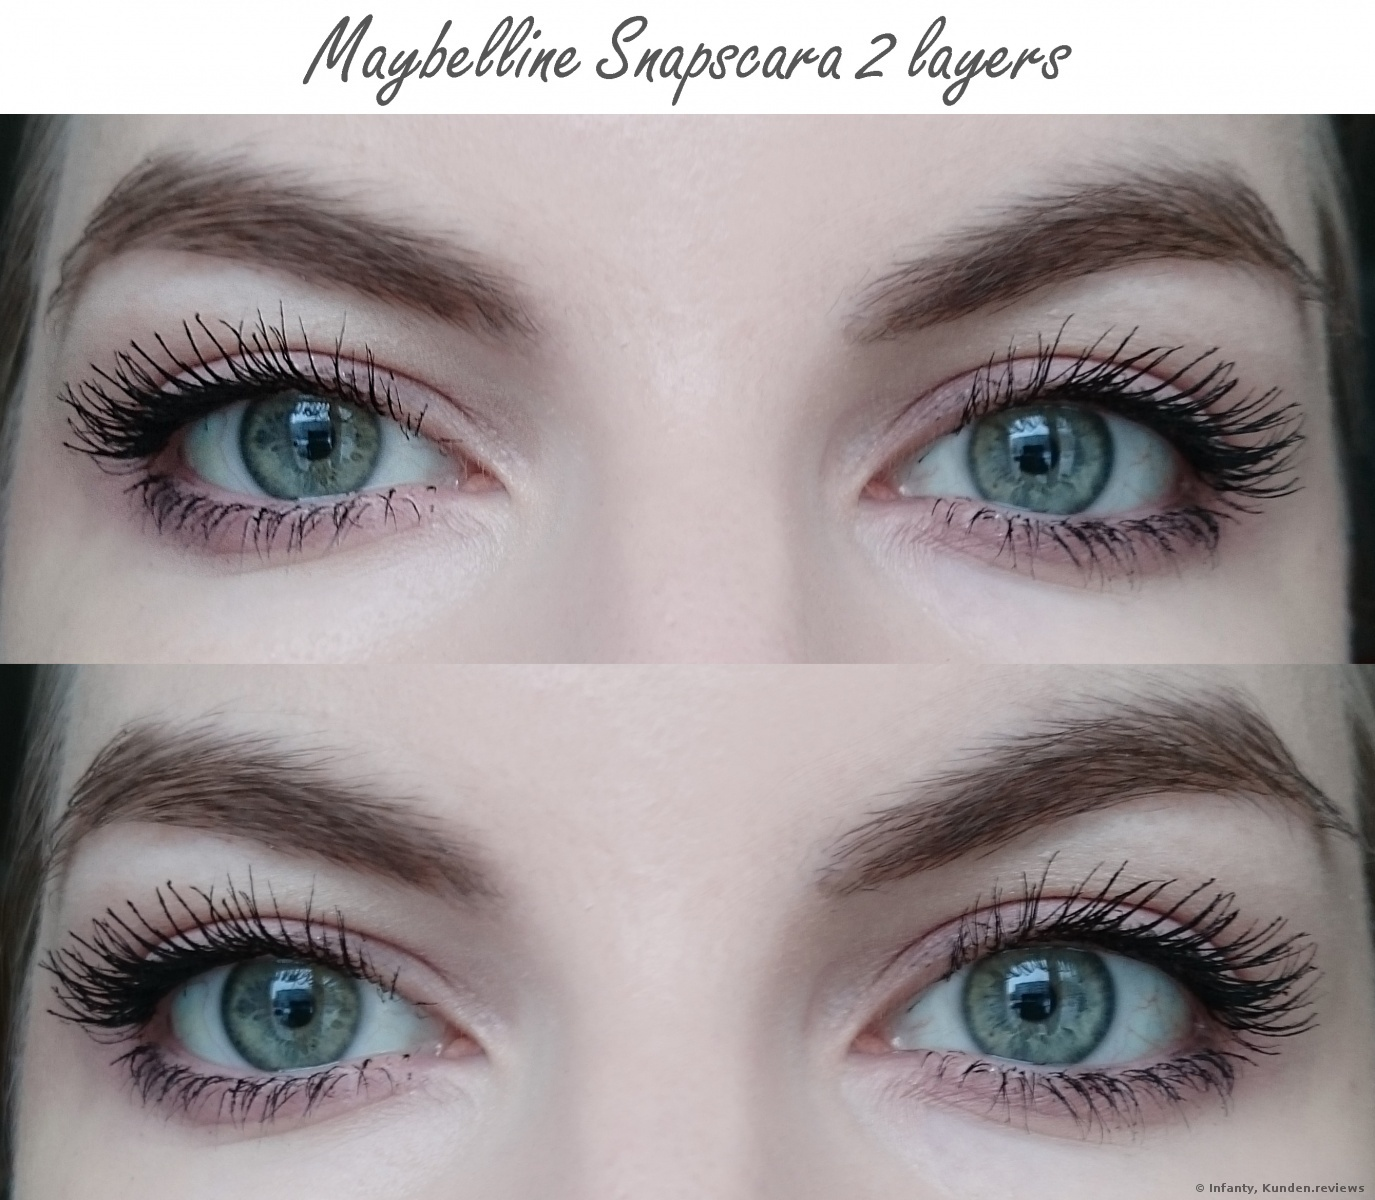 Maybelline New York Snapscara Mascara